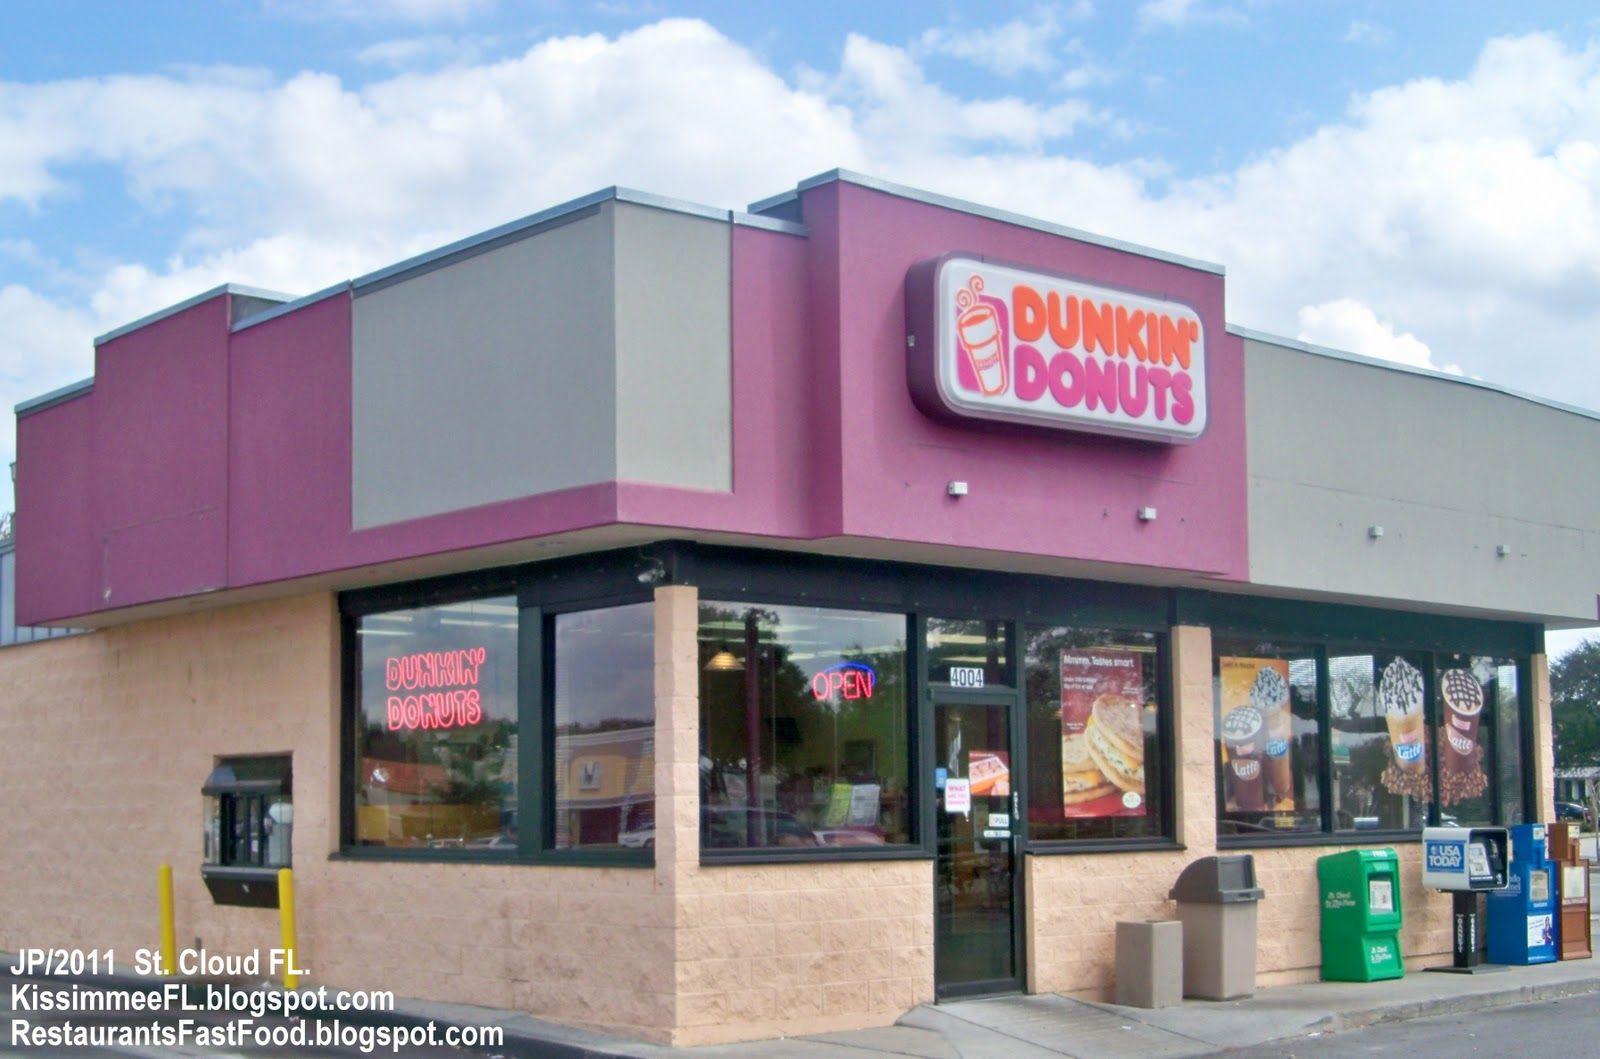 DUNKIN DONUT SHOP PICTURES DUNKIN DONUTS SAINT CLOUD FLORIDA - Dunkin donuts location map usa